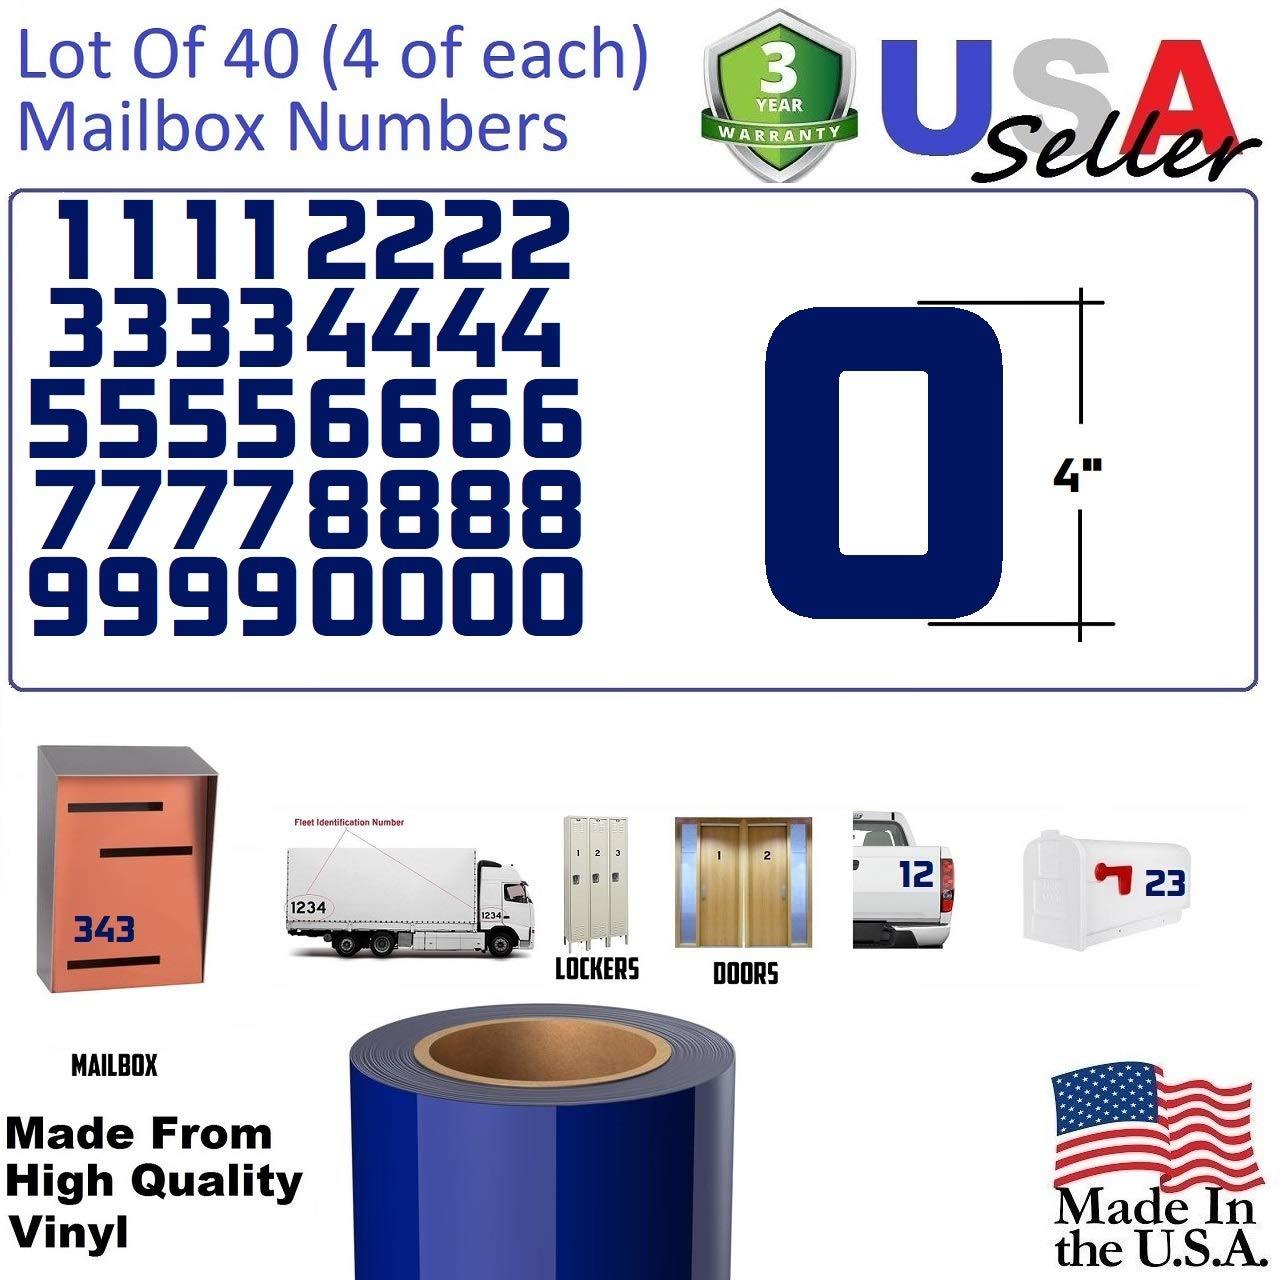 4'' Blue Color Custom Mailbox Numbers - Lot of 40(4 of each number form 0 to 9) 4 inch tall, Blue Modern Vinyl Mailbox Numbers,Doors,Tool Box,Locker,Car,Truck,Address Decal Stickers (Konkretika Bold)